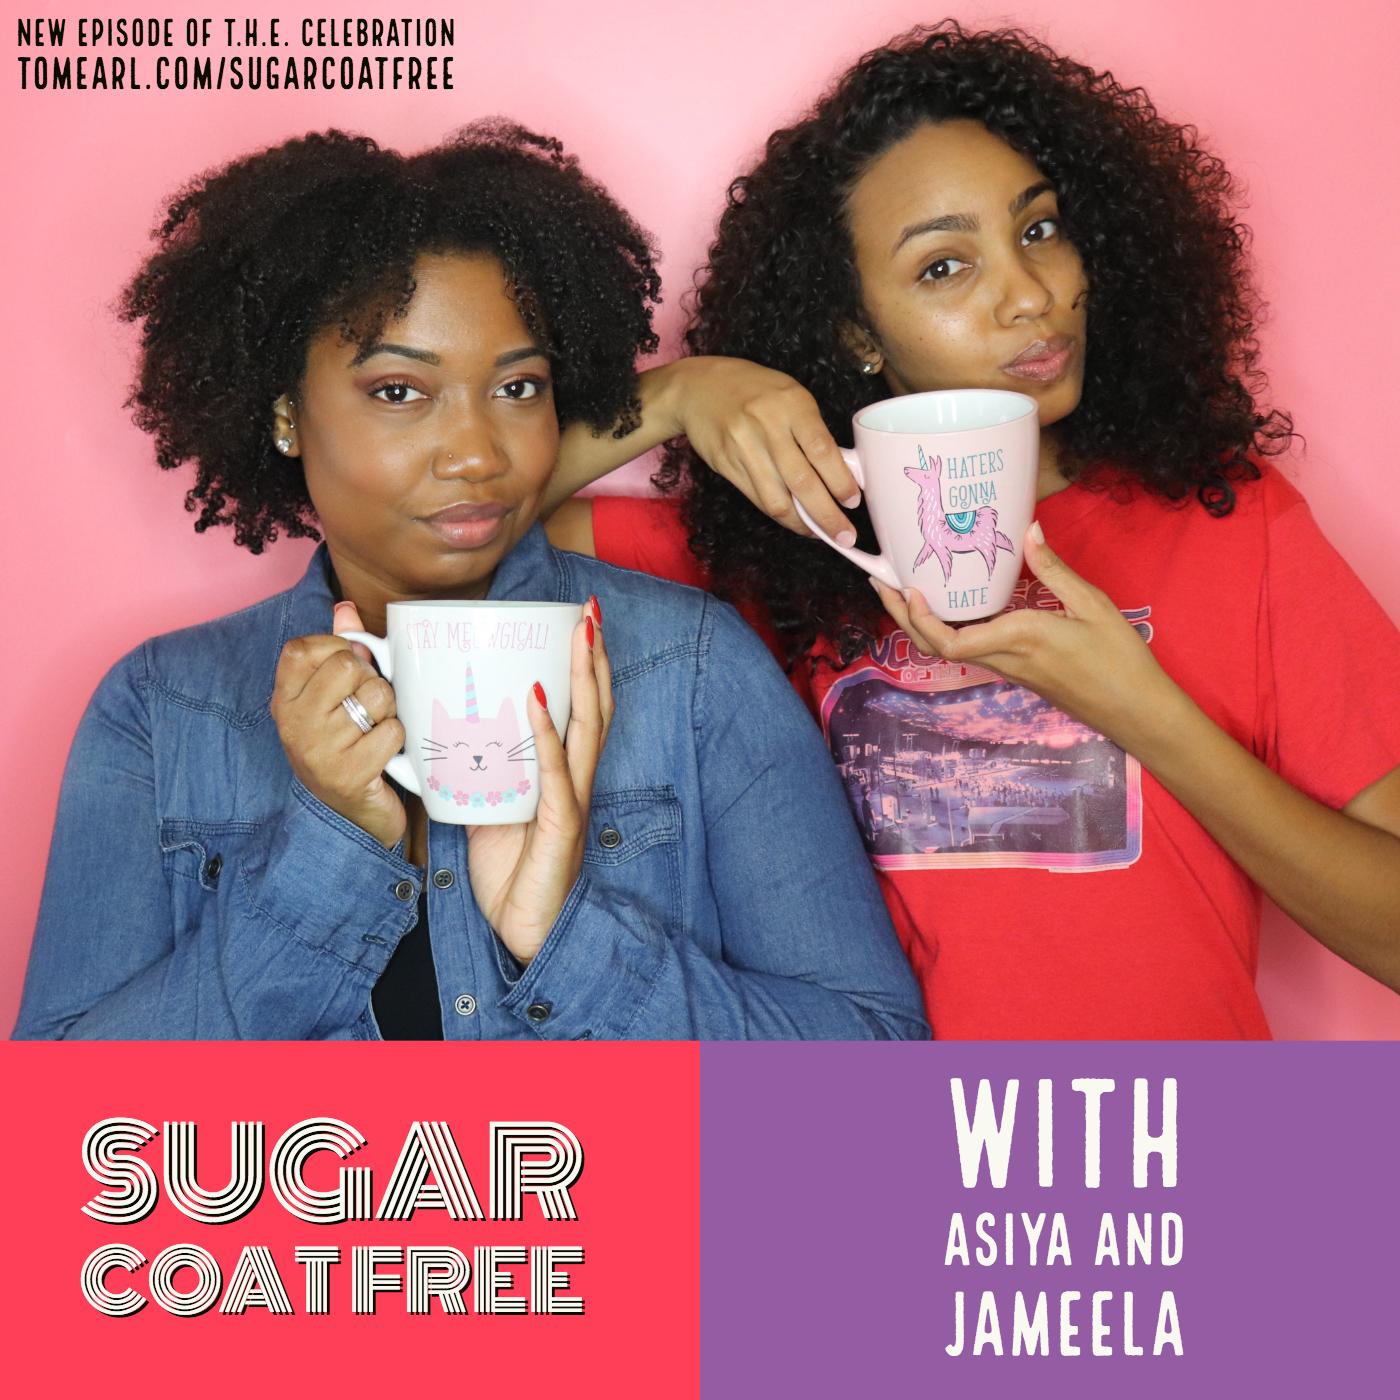 sugar coat free.JPG